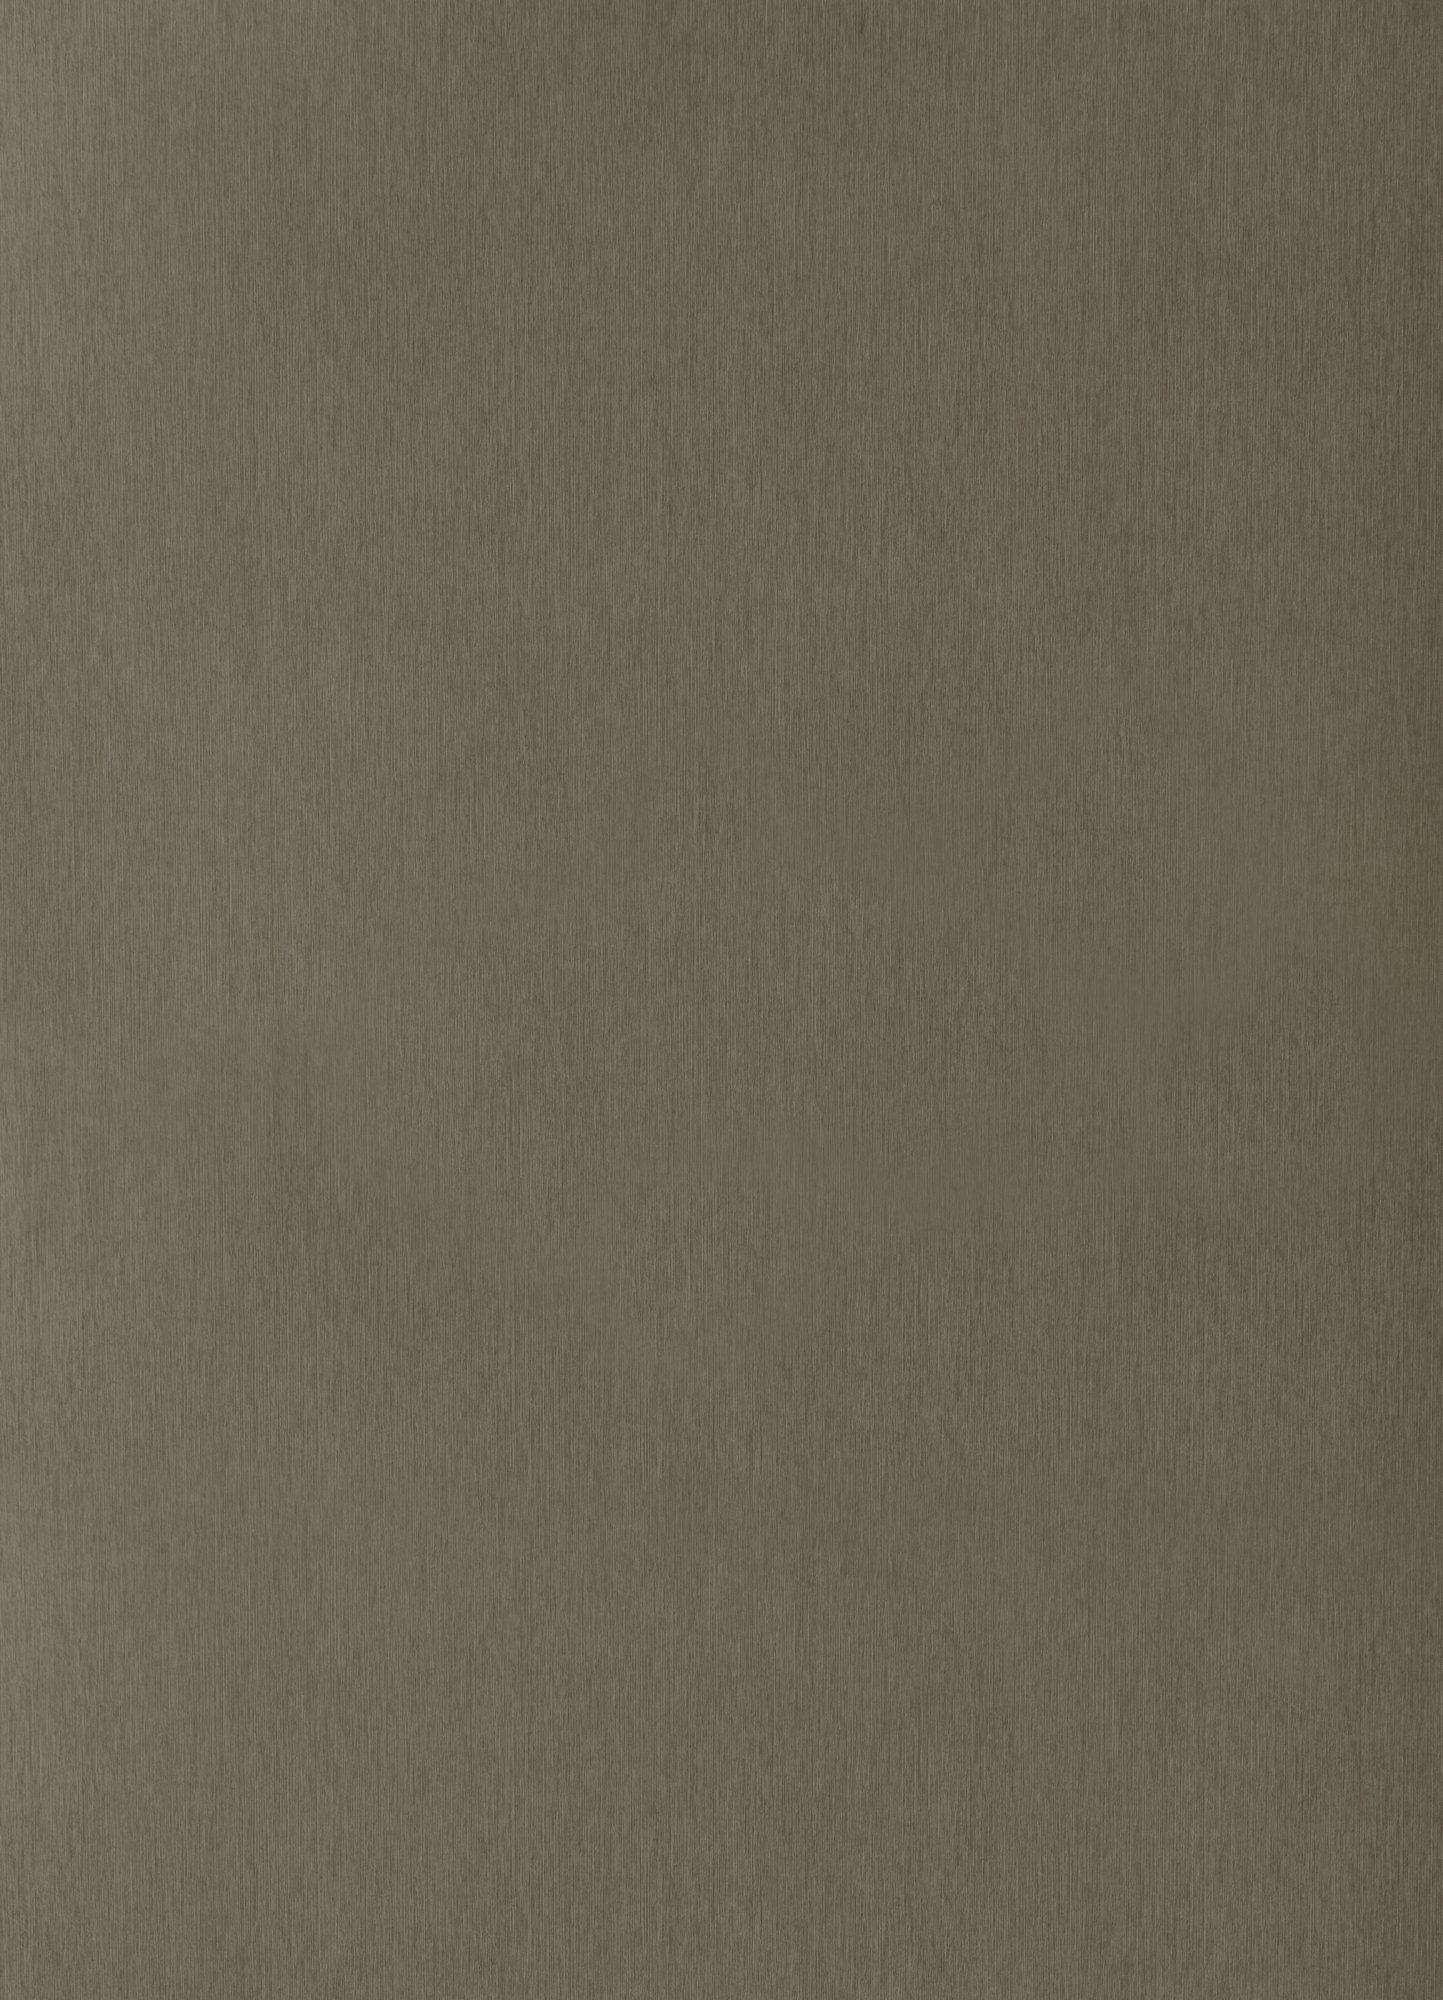 FB66 Reflex MDF - DecoLegno by Cleaf - hele plaat Tekenprogramma 2800x2070mm